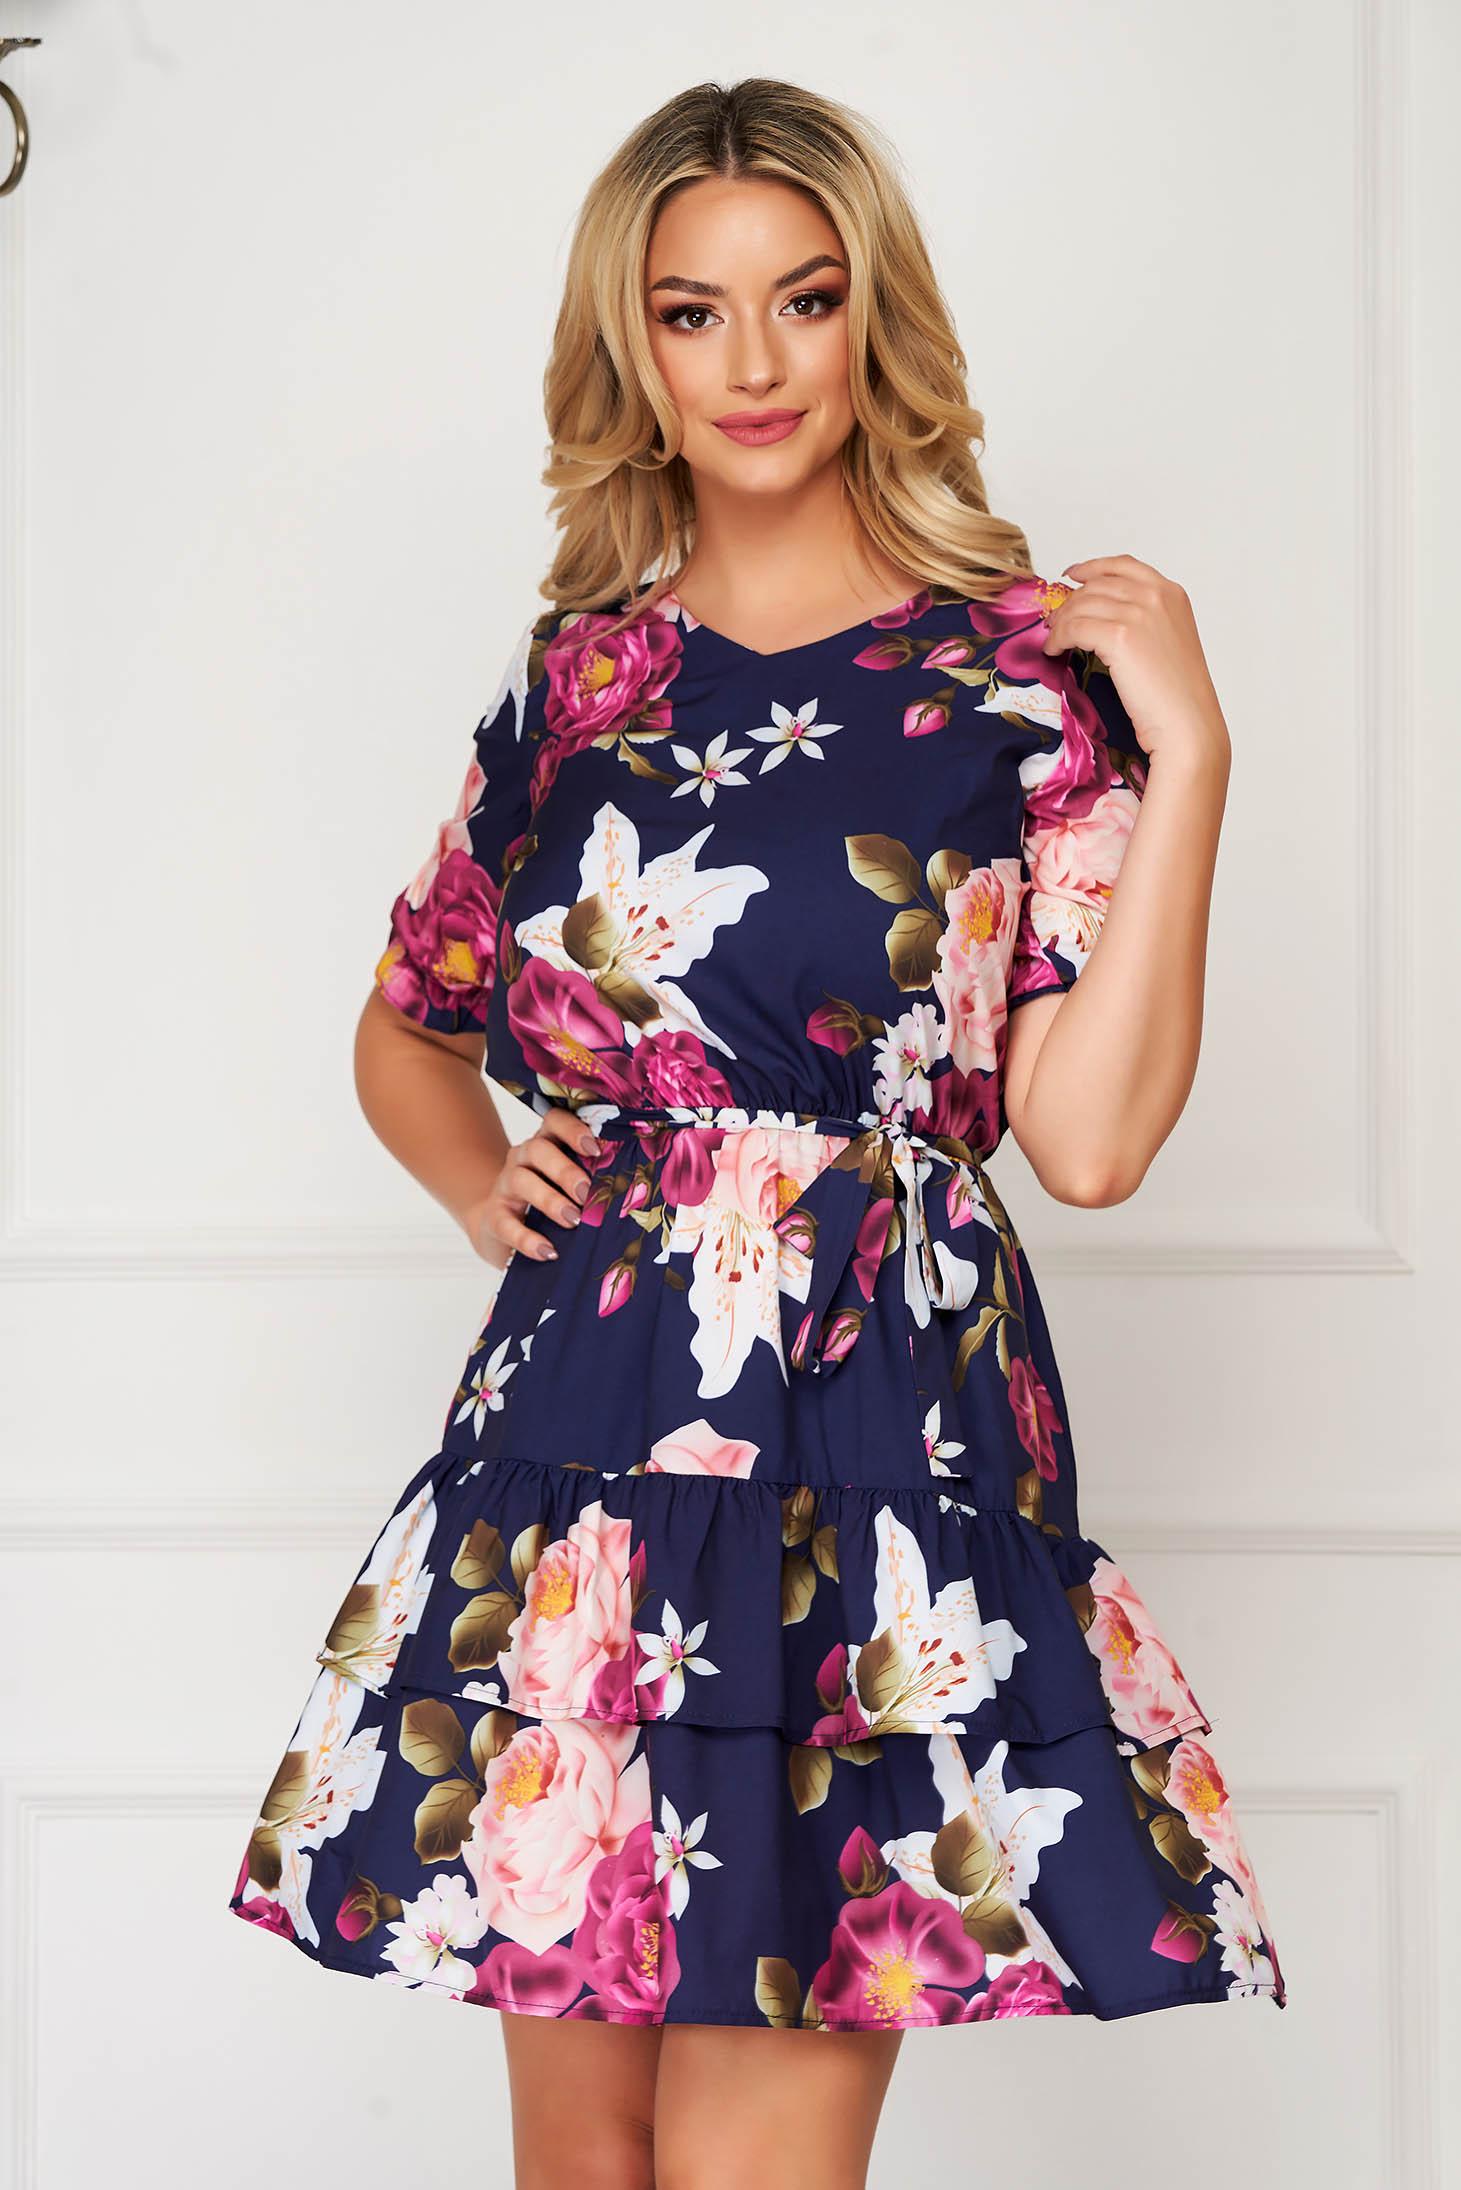 StarShinerS darkblue dress short cut daily thin fabric short sleeves